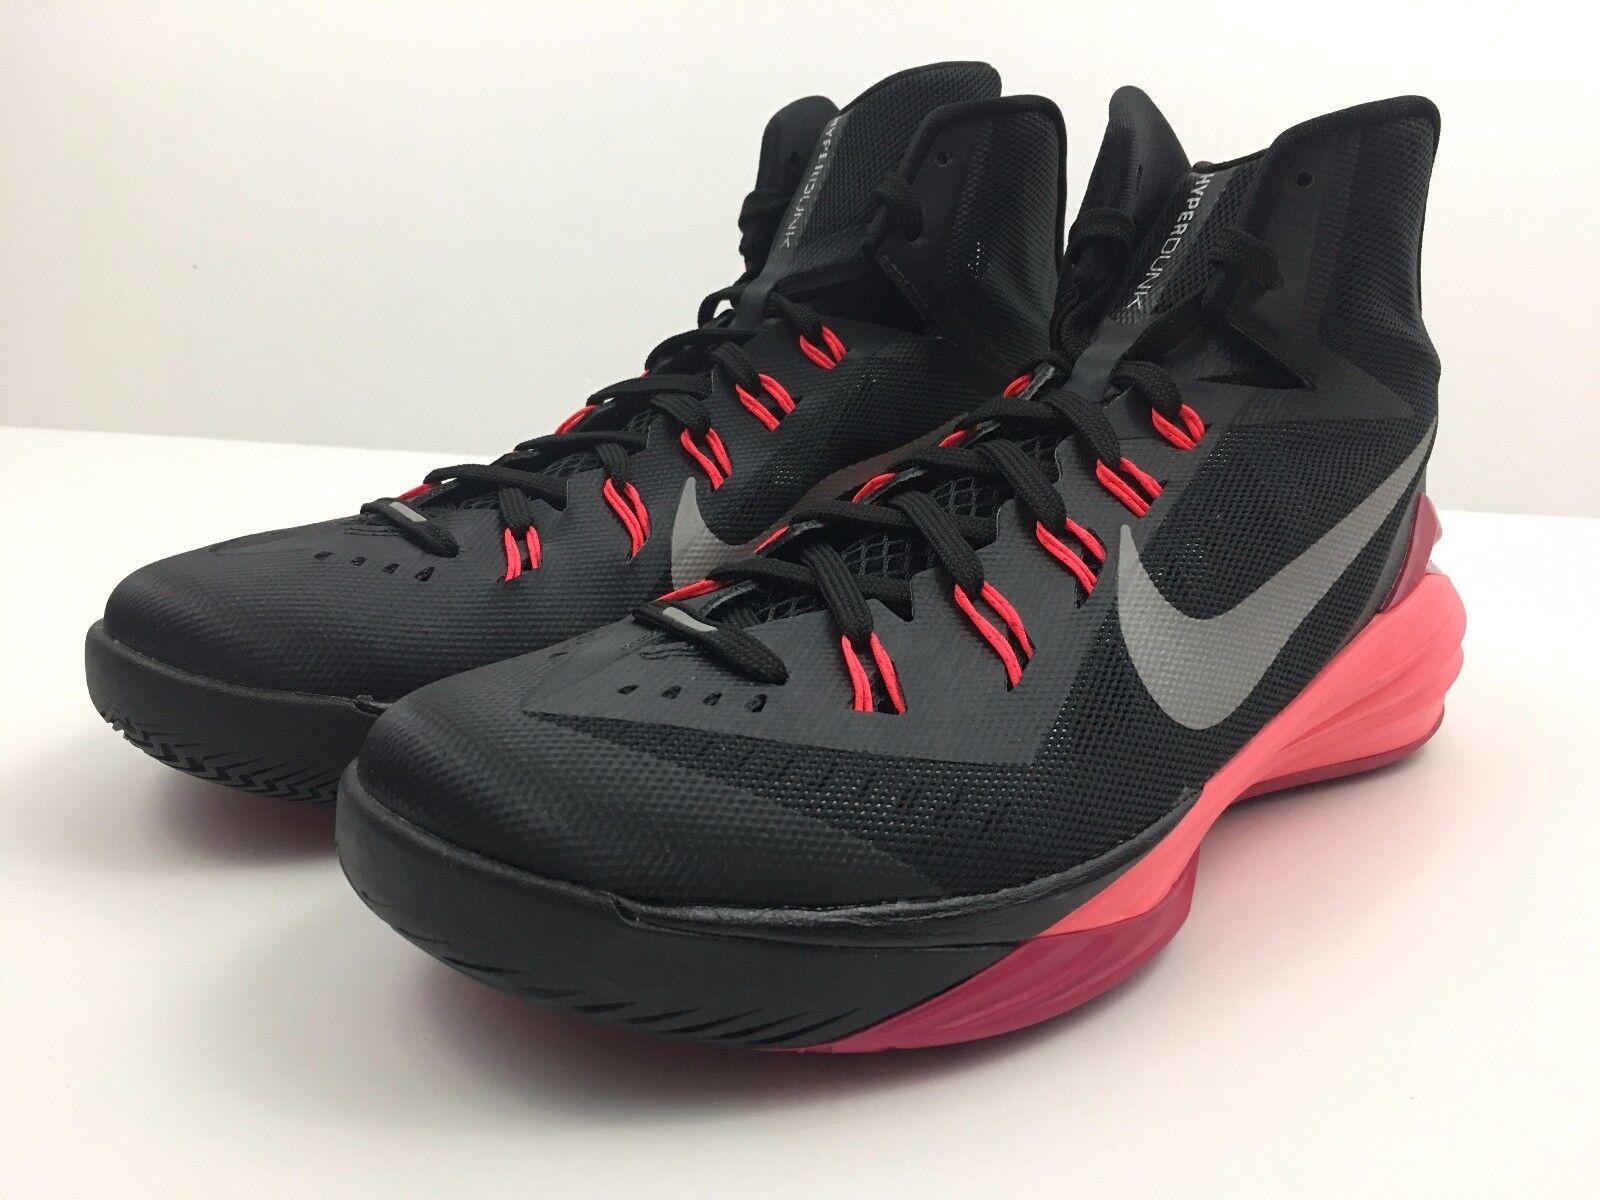 7b8a076e42e ... best price new zealand nike punch hyperdunk 2014 black 653640 006 punch nike  basketball shoes mens